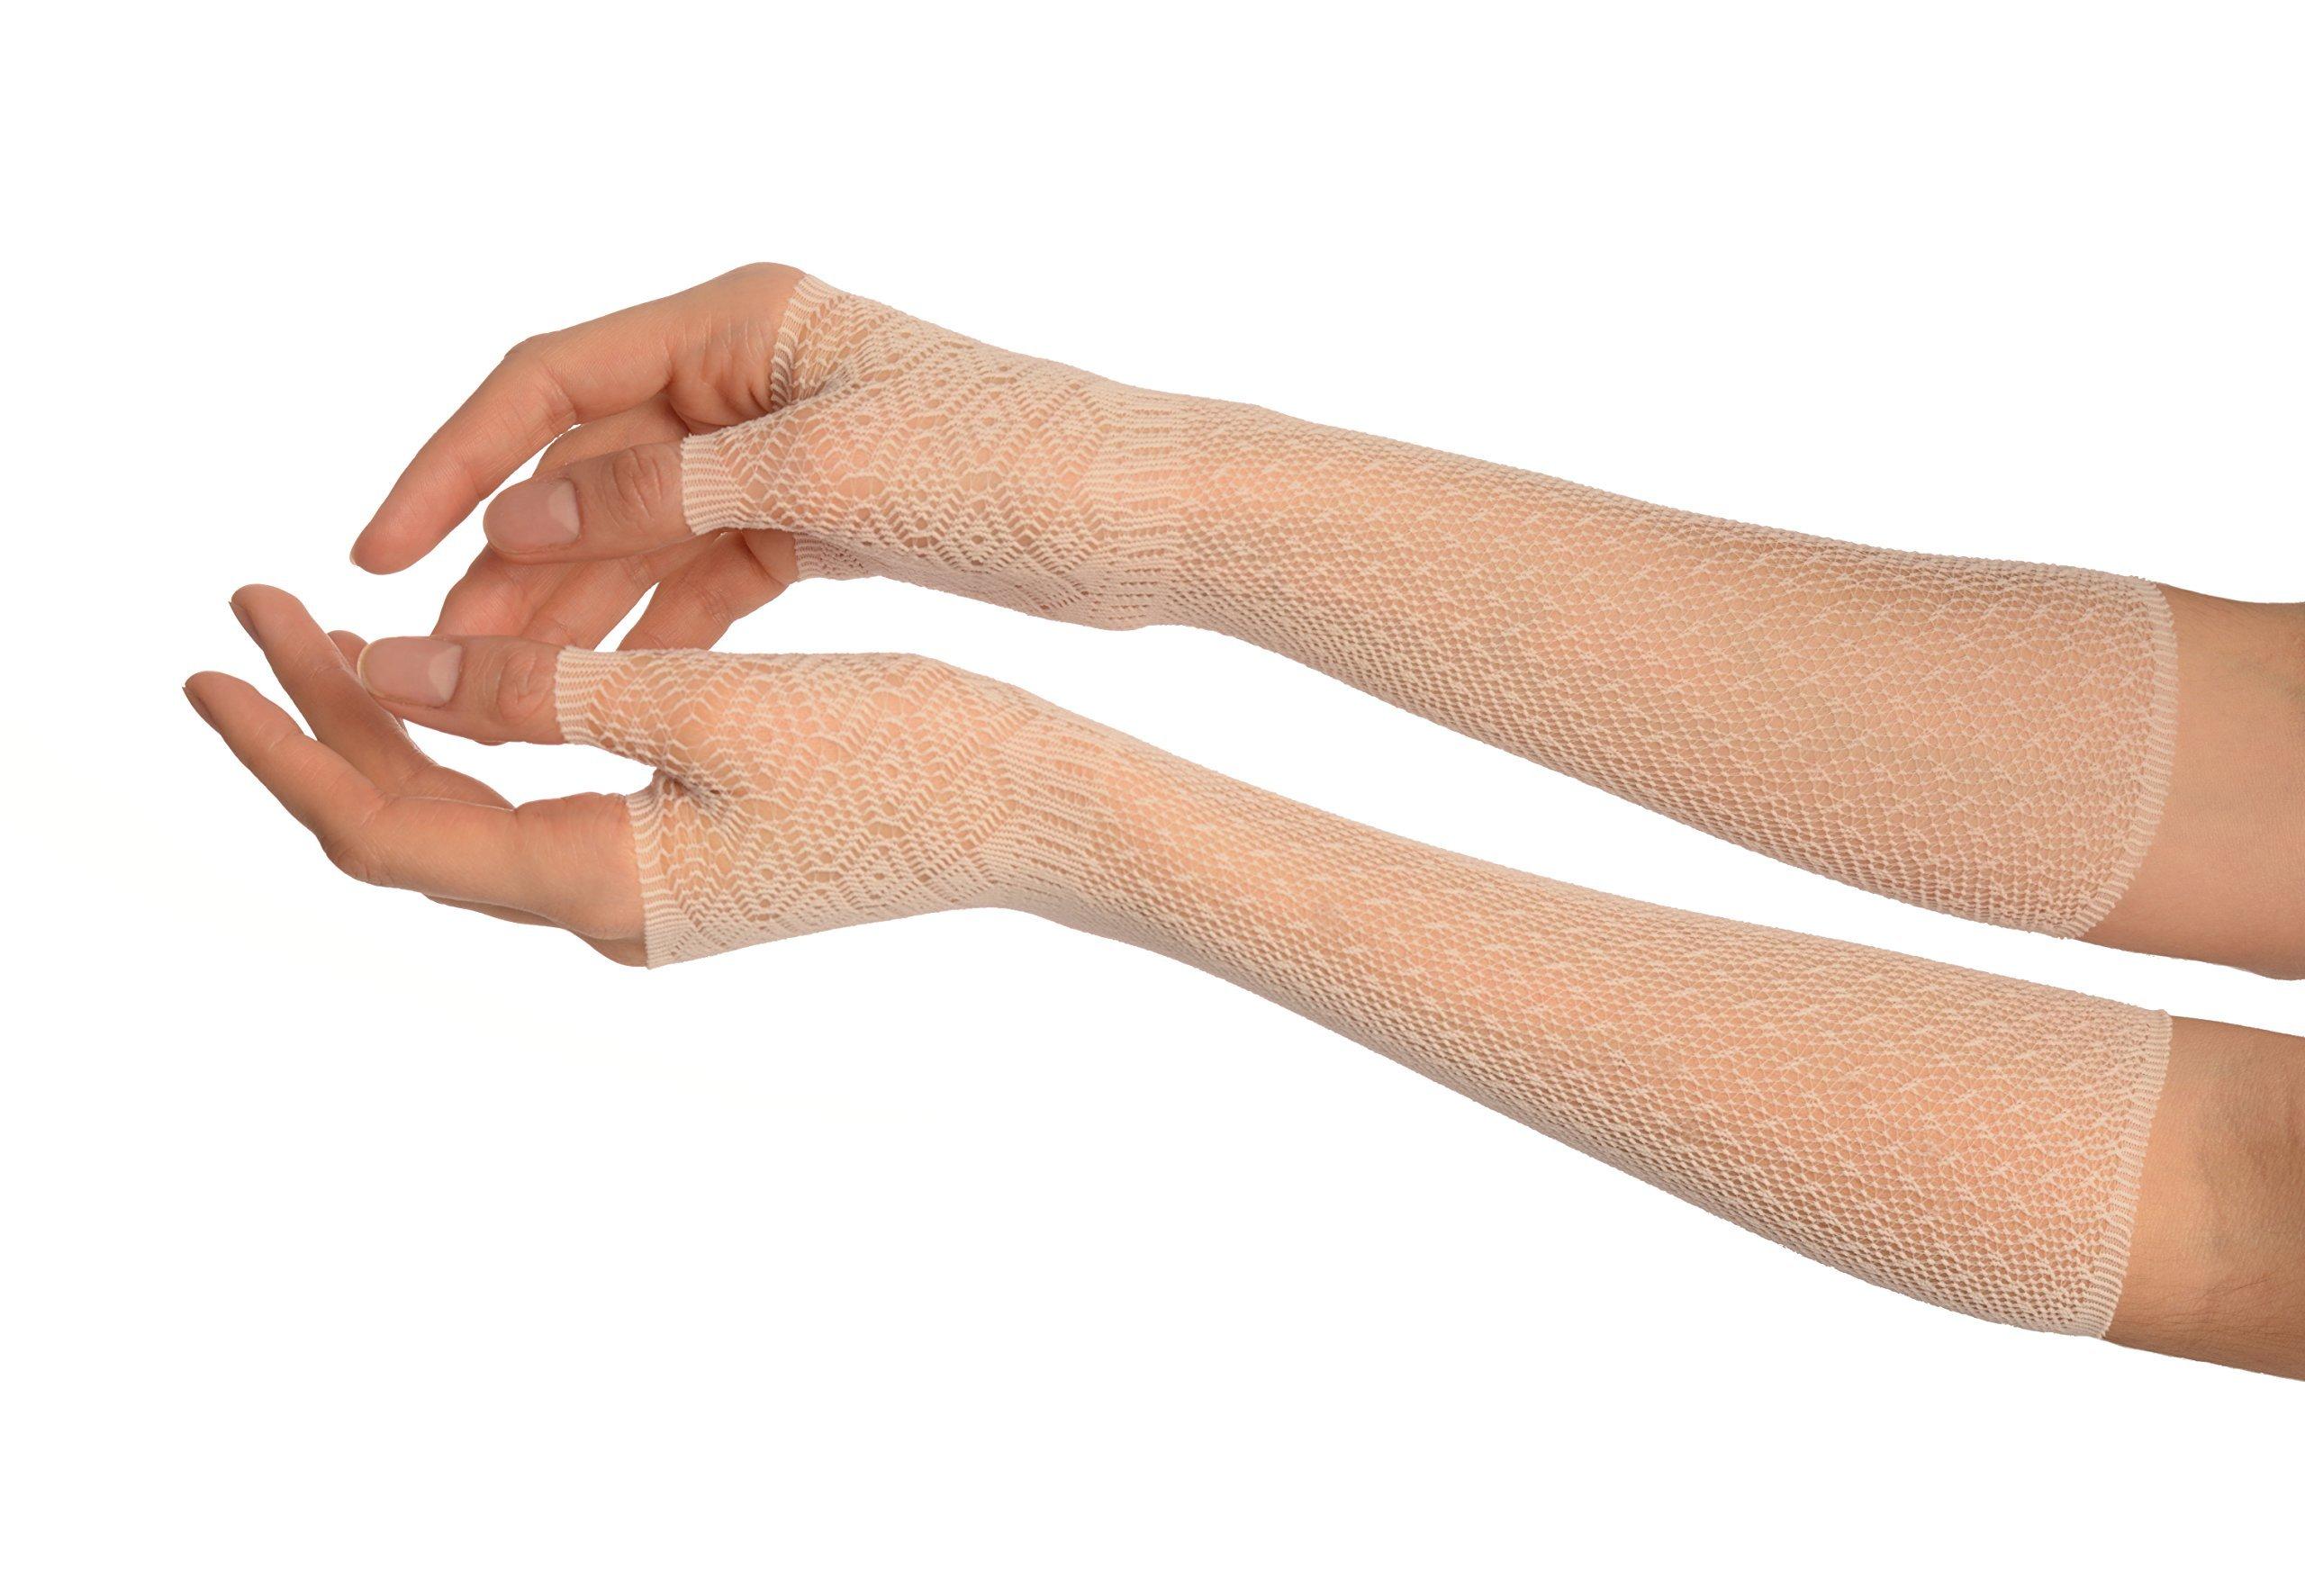 Cream Stretchy Crochet Lace Fingerless Evening Gloves - Gloves